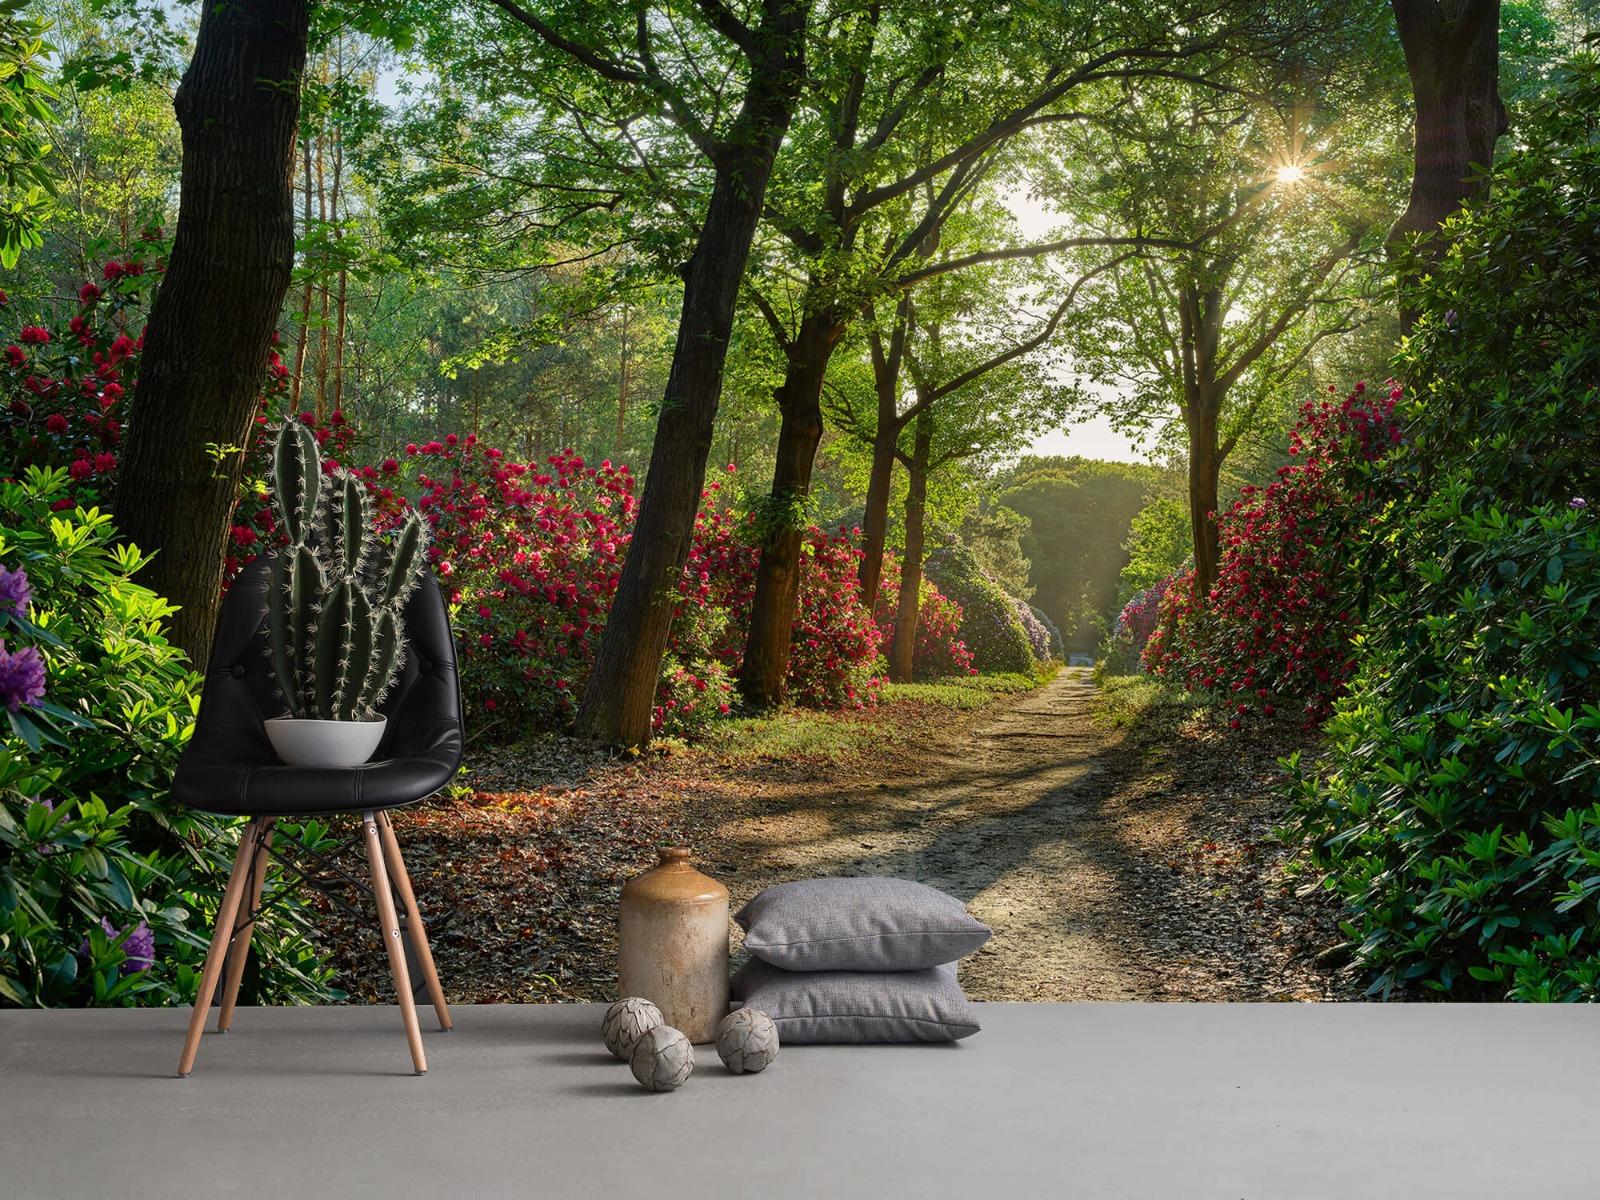 Bos - Zonsopkomst bij pad met rhododendrons 1